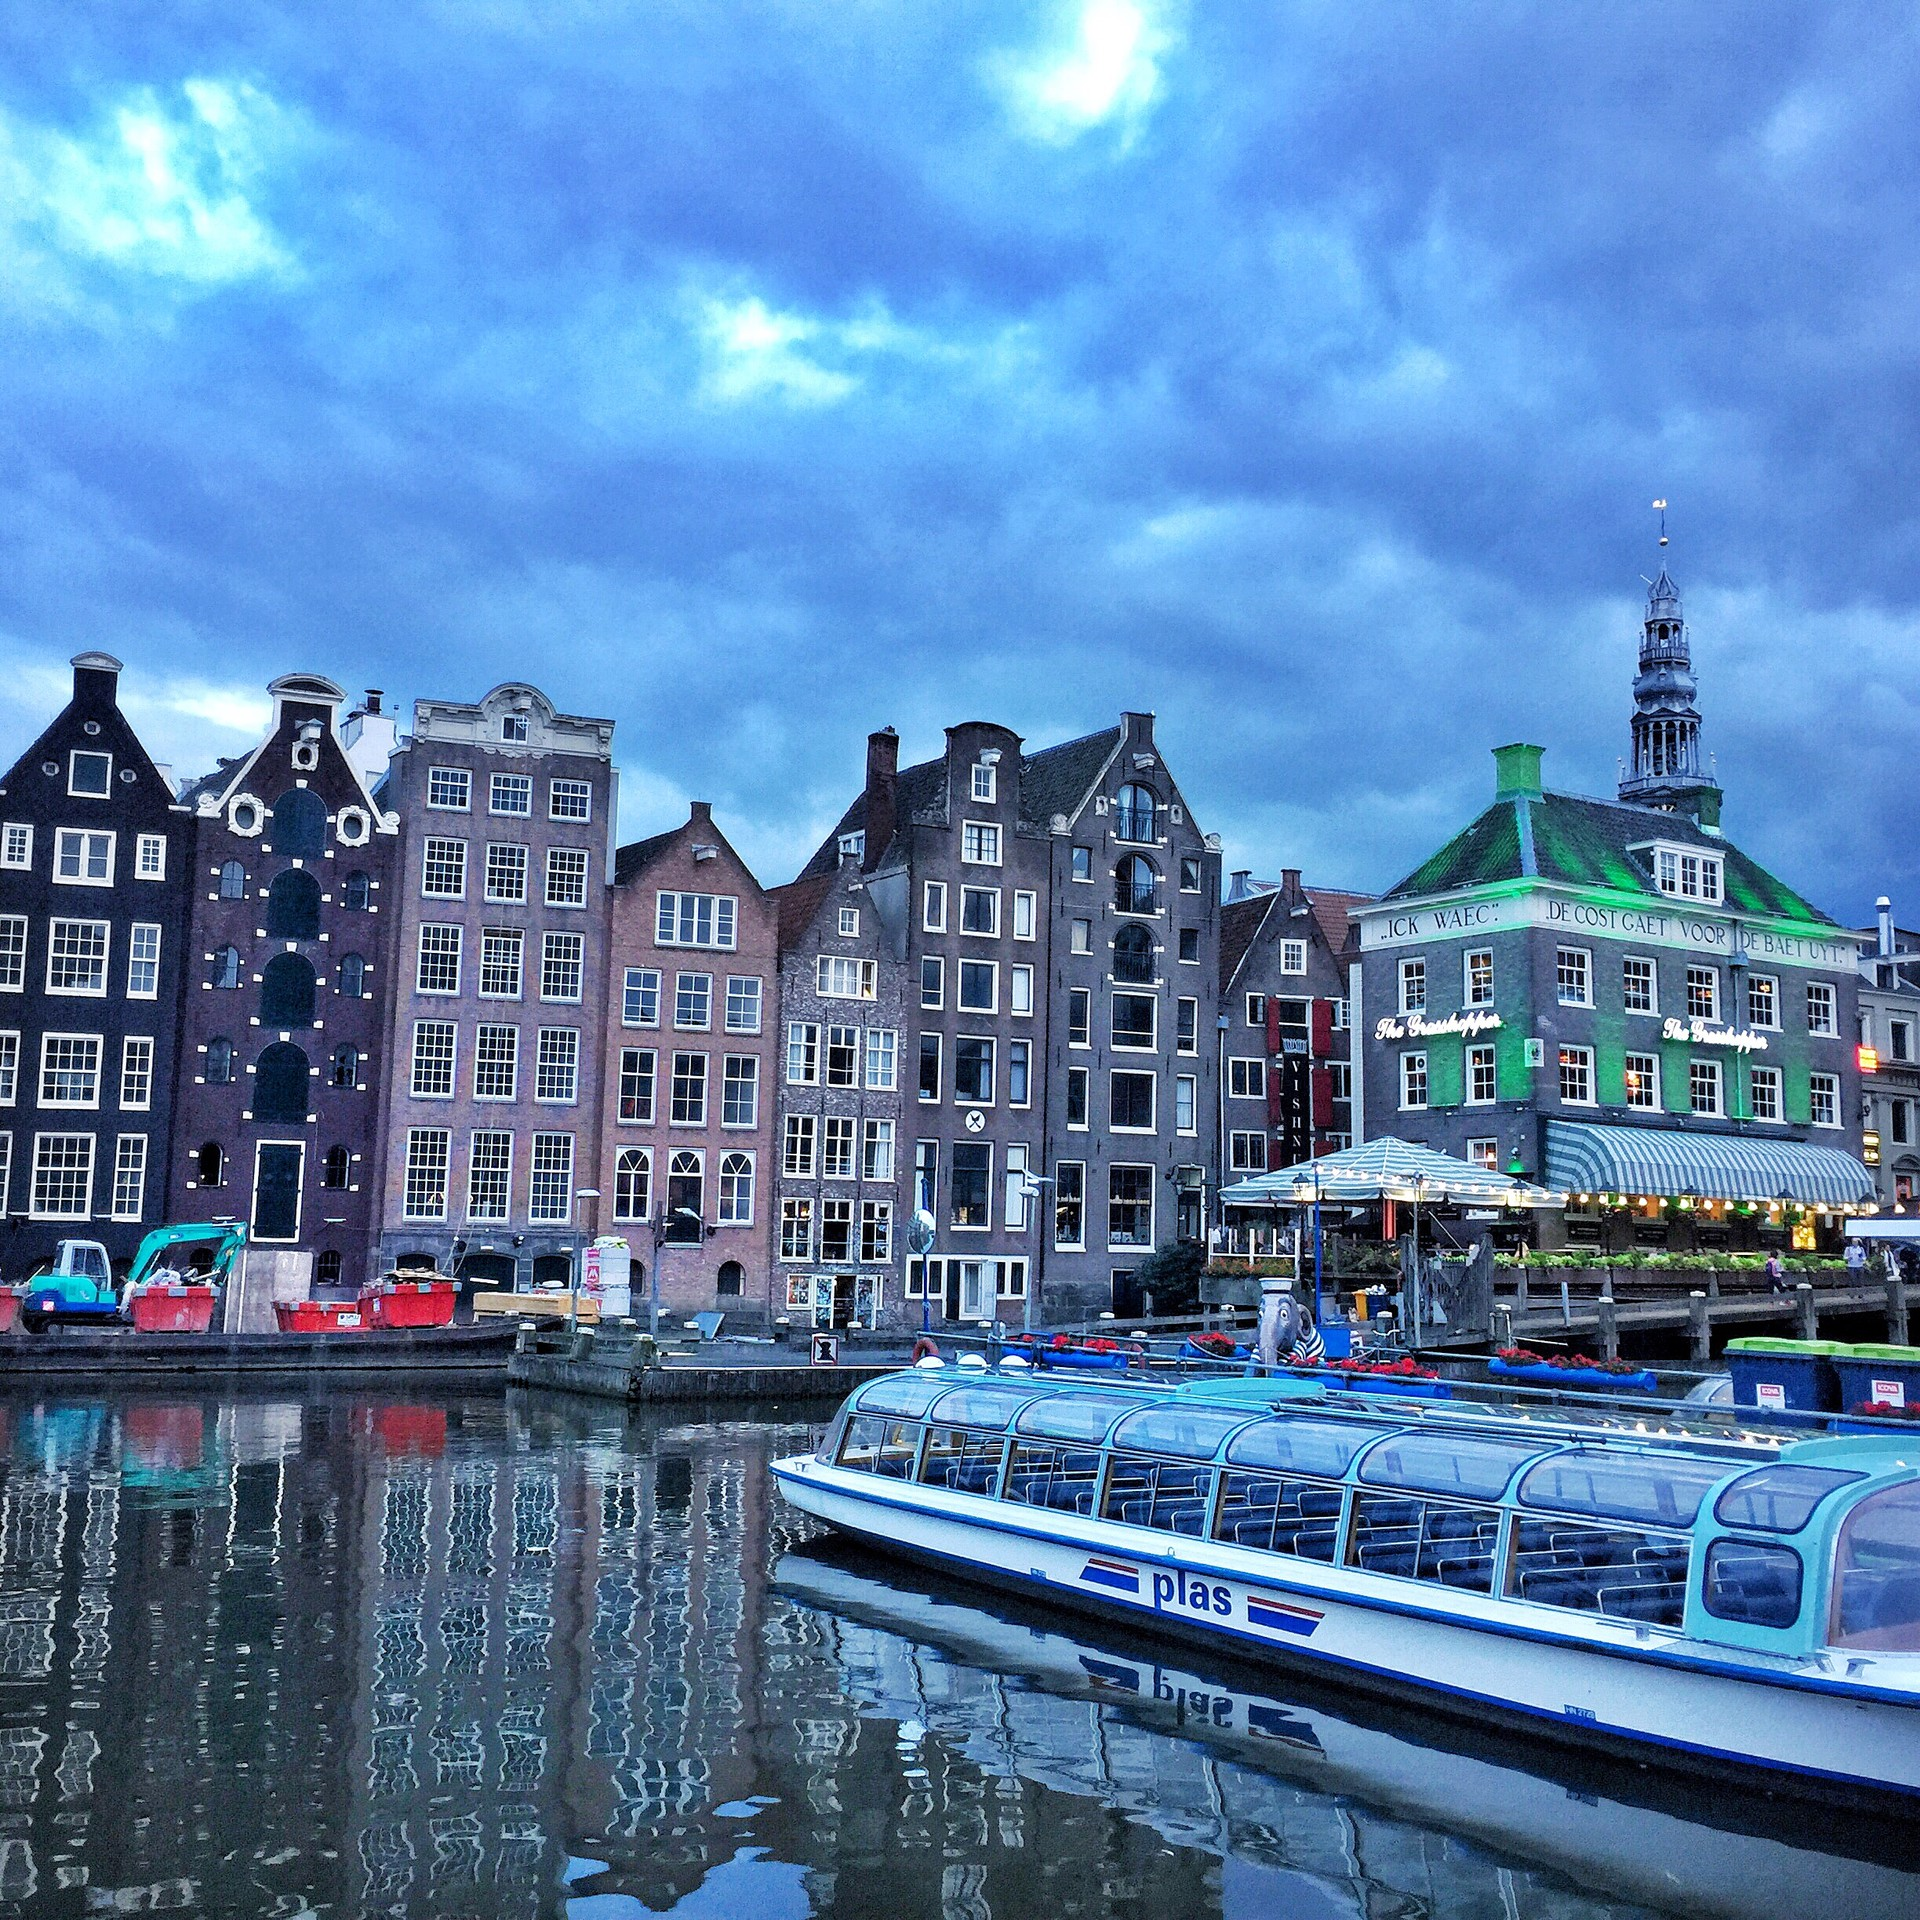 le-dancing-houses-amsterdam-a24759ecda7b